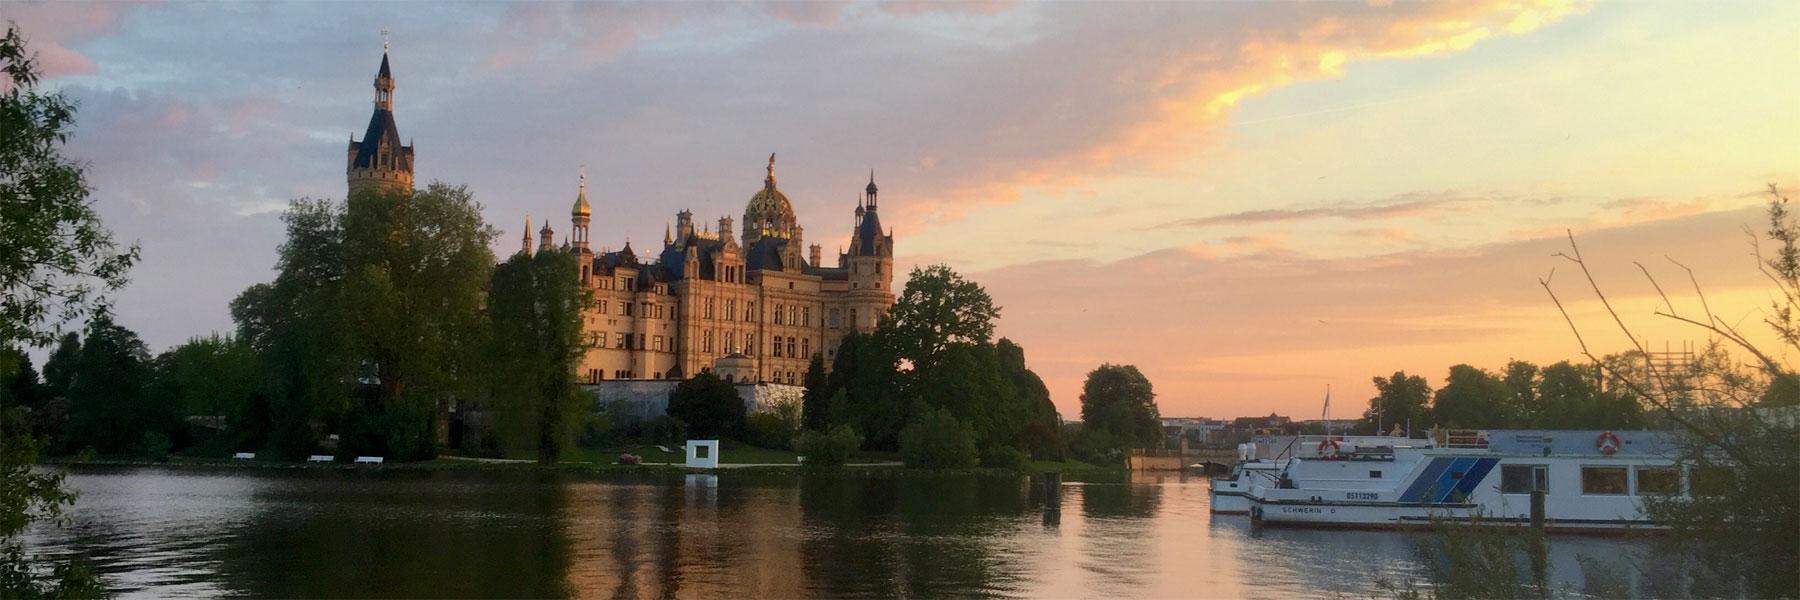 Schloss - Landhaus Schwerin